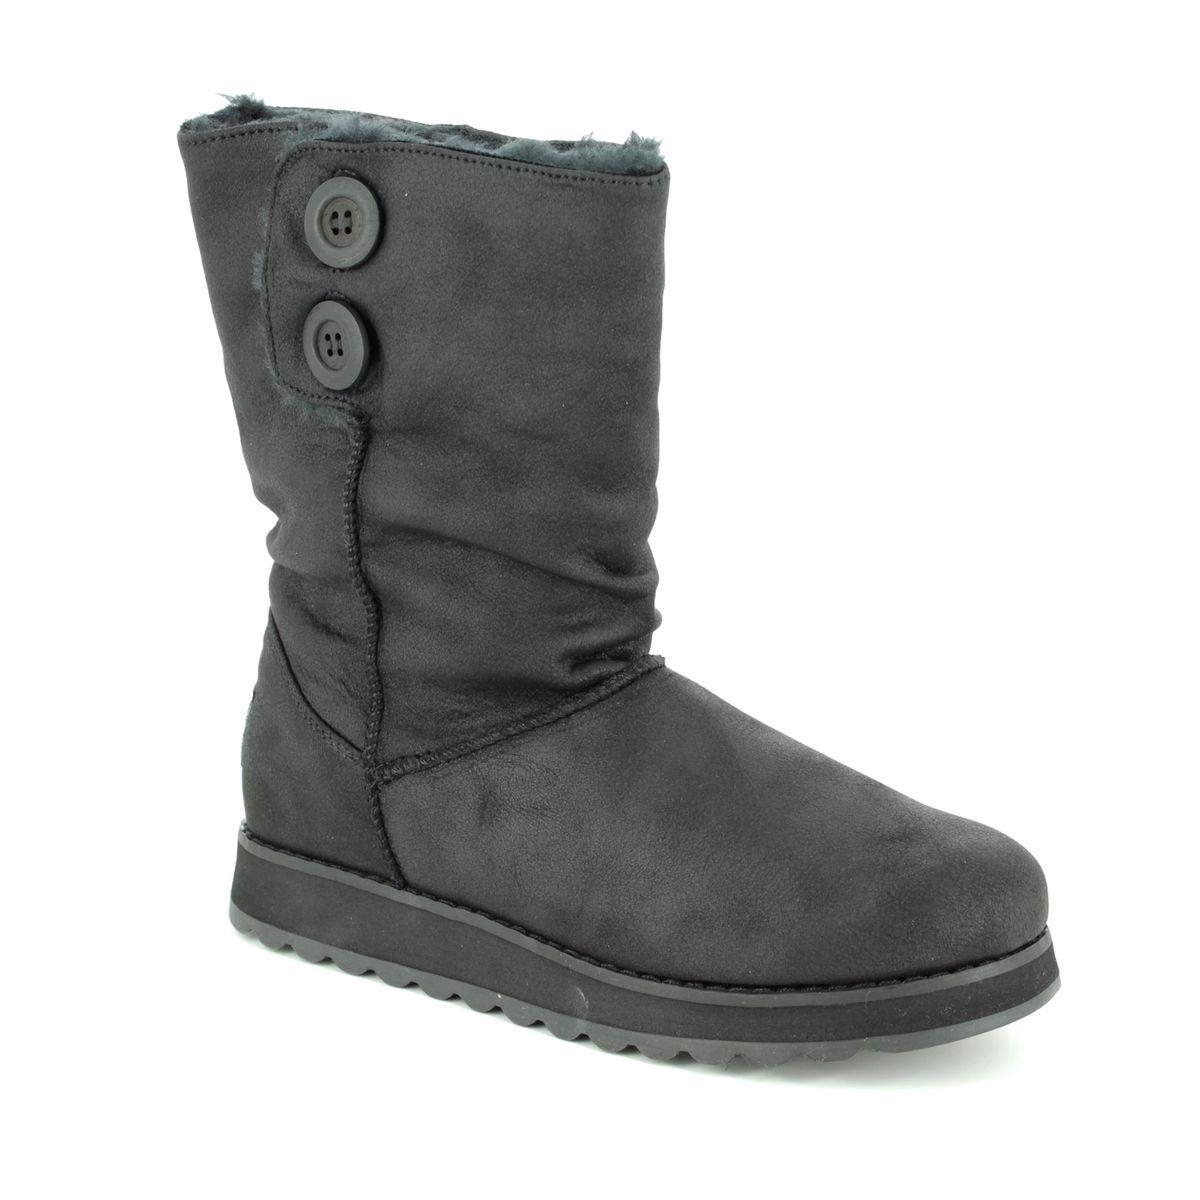 c0d39f2f02676 Skechers Keepsakes 2.0 44933 BLK Black knee-high boots